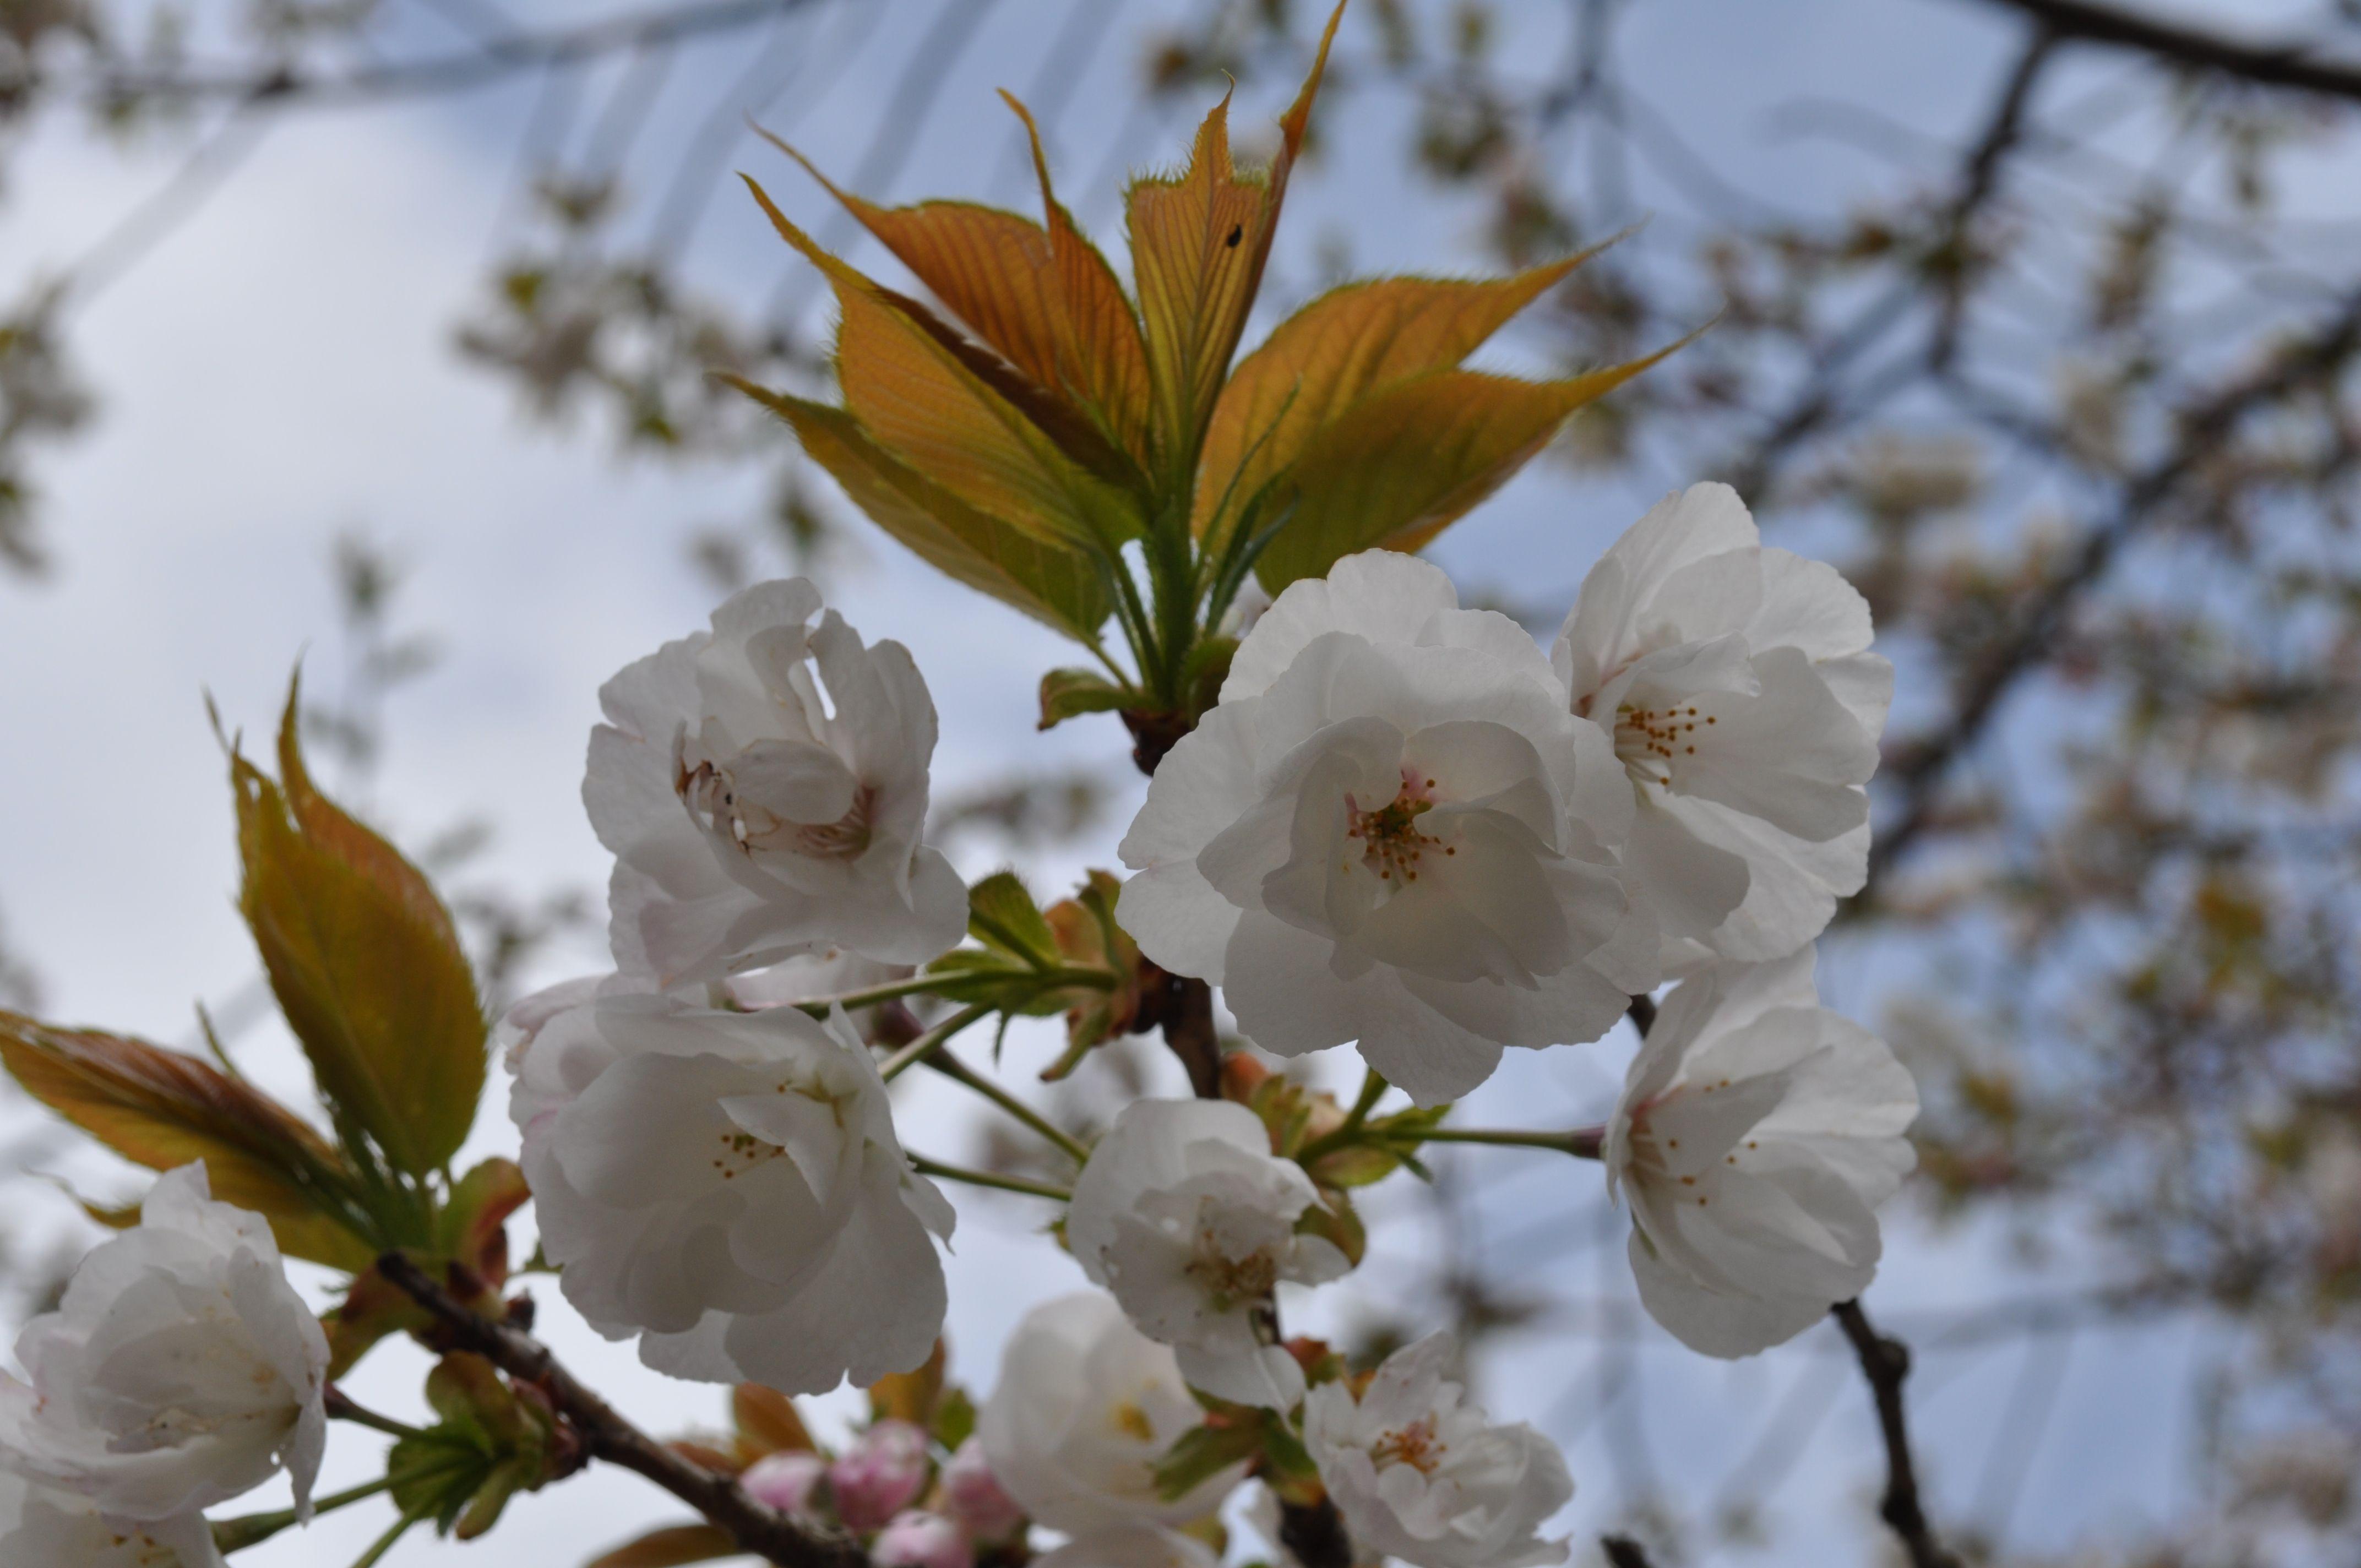 A cherry blossom breaks up immediately i feel a lonely feeling in